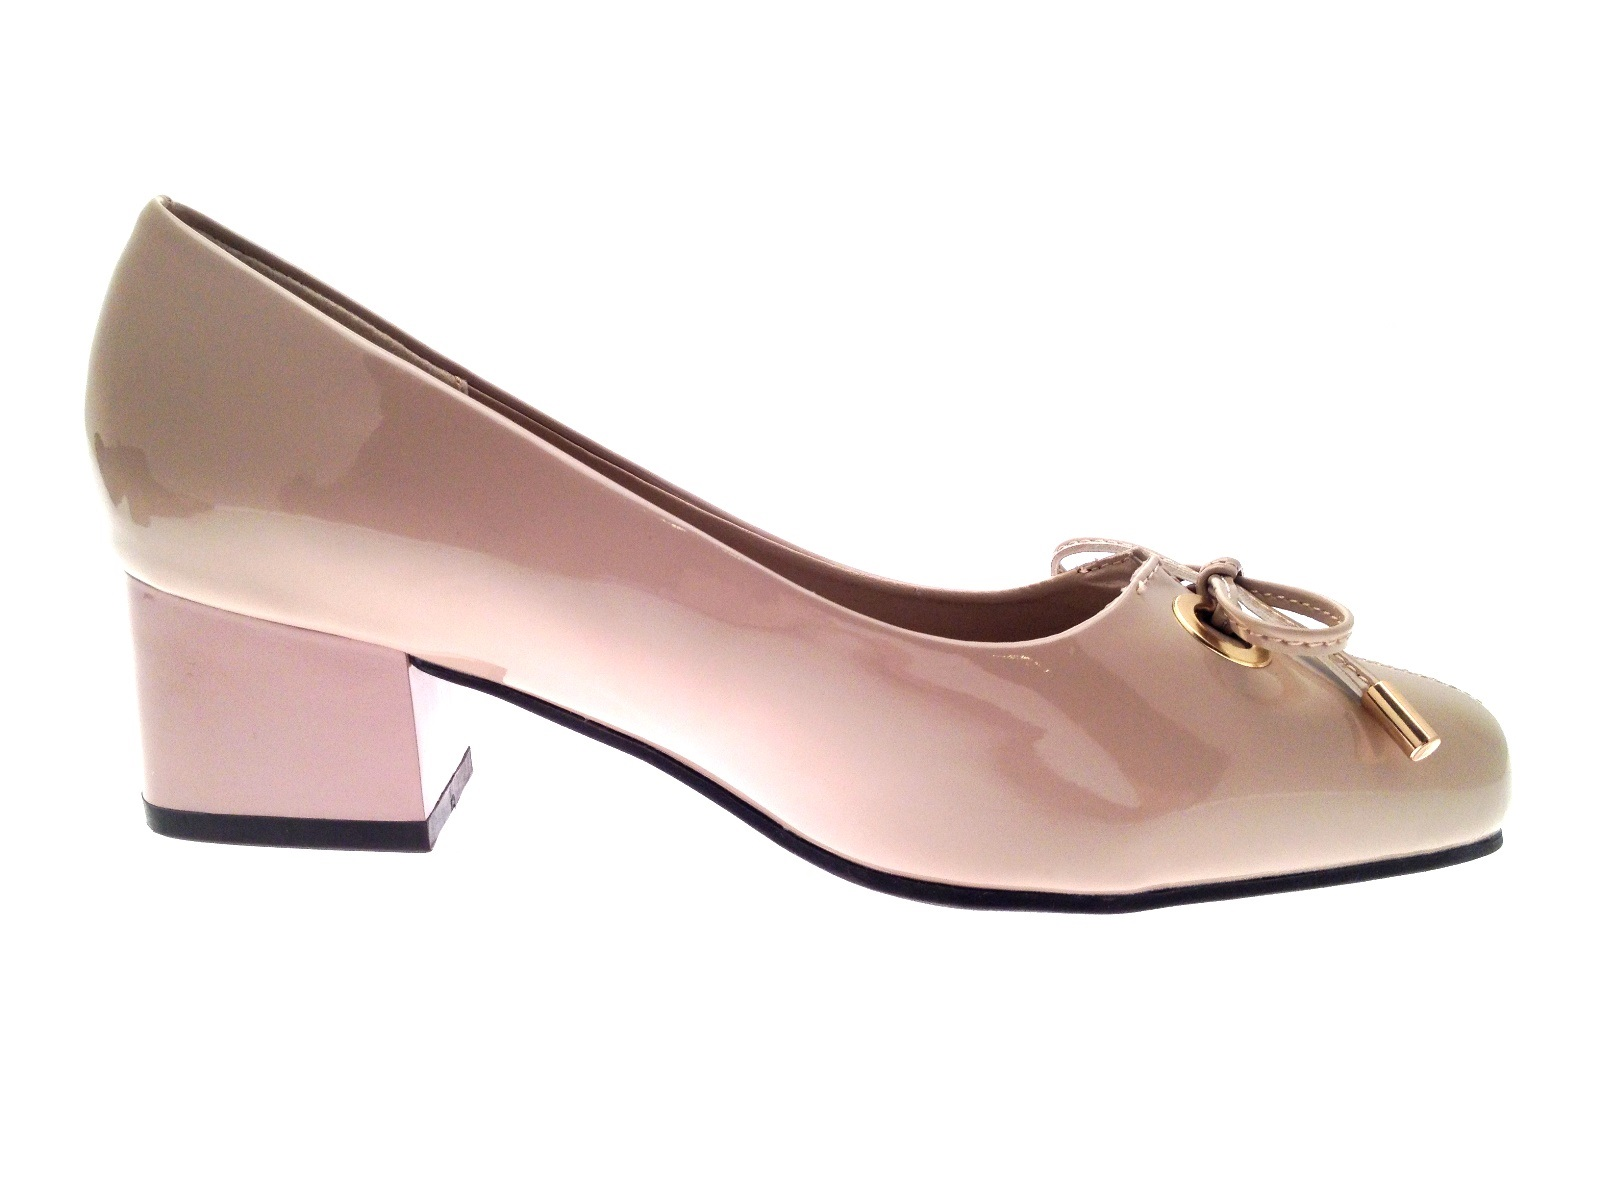 Wide fit sandals shoes uk - Womens Patent Low Block Heels Wide Fit Comfort